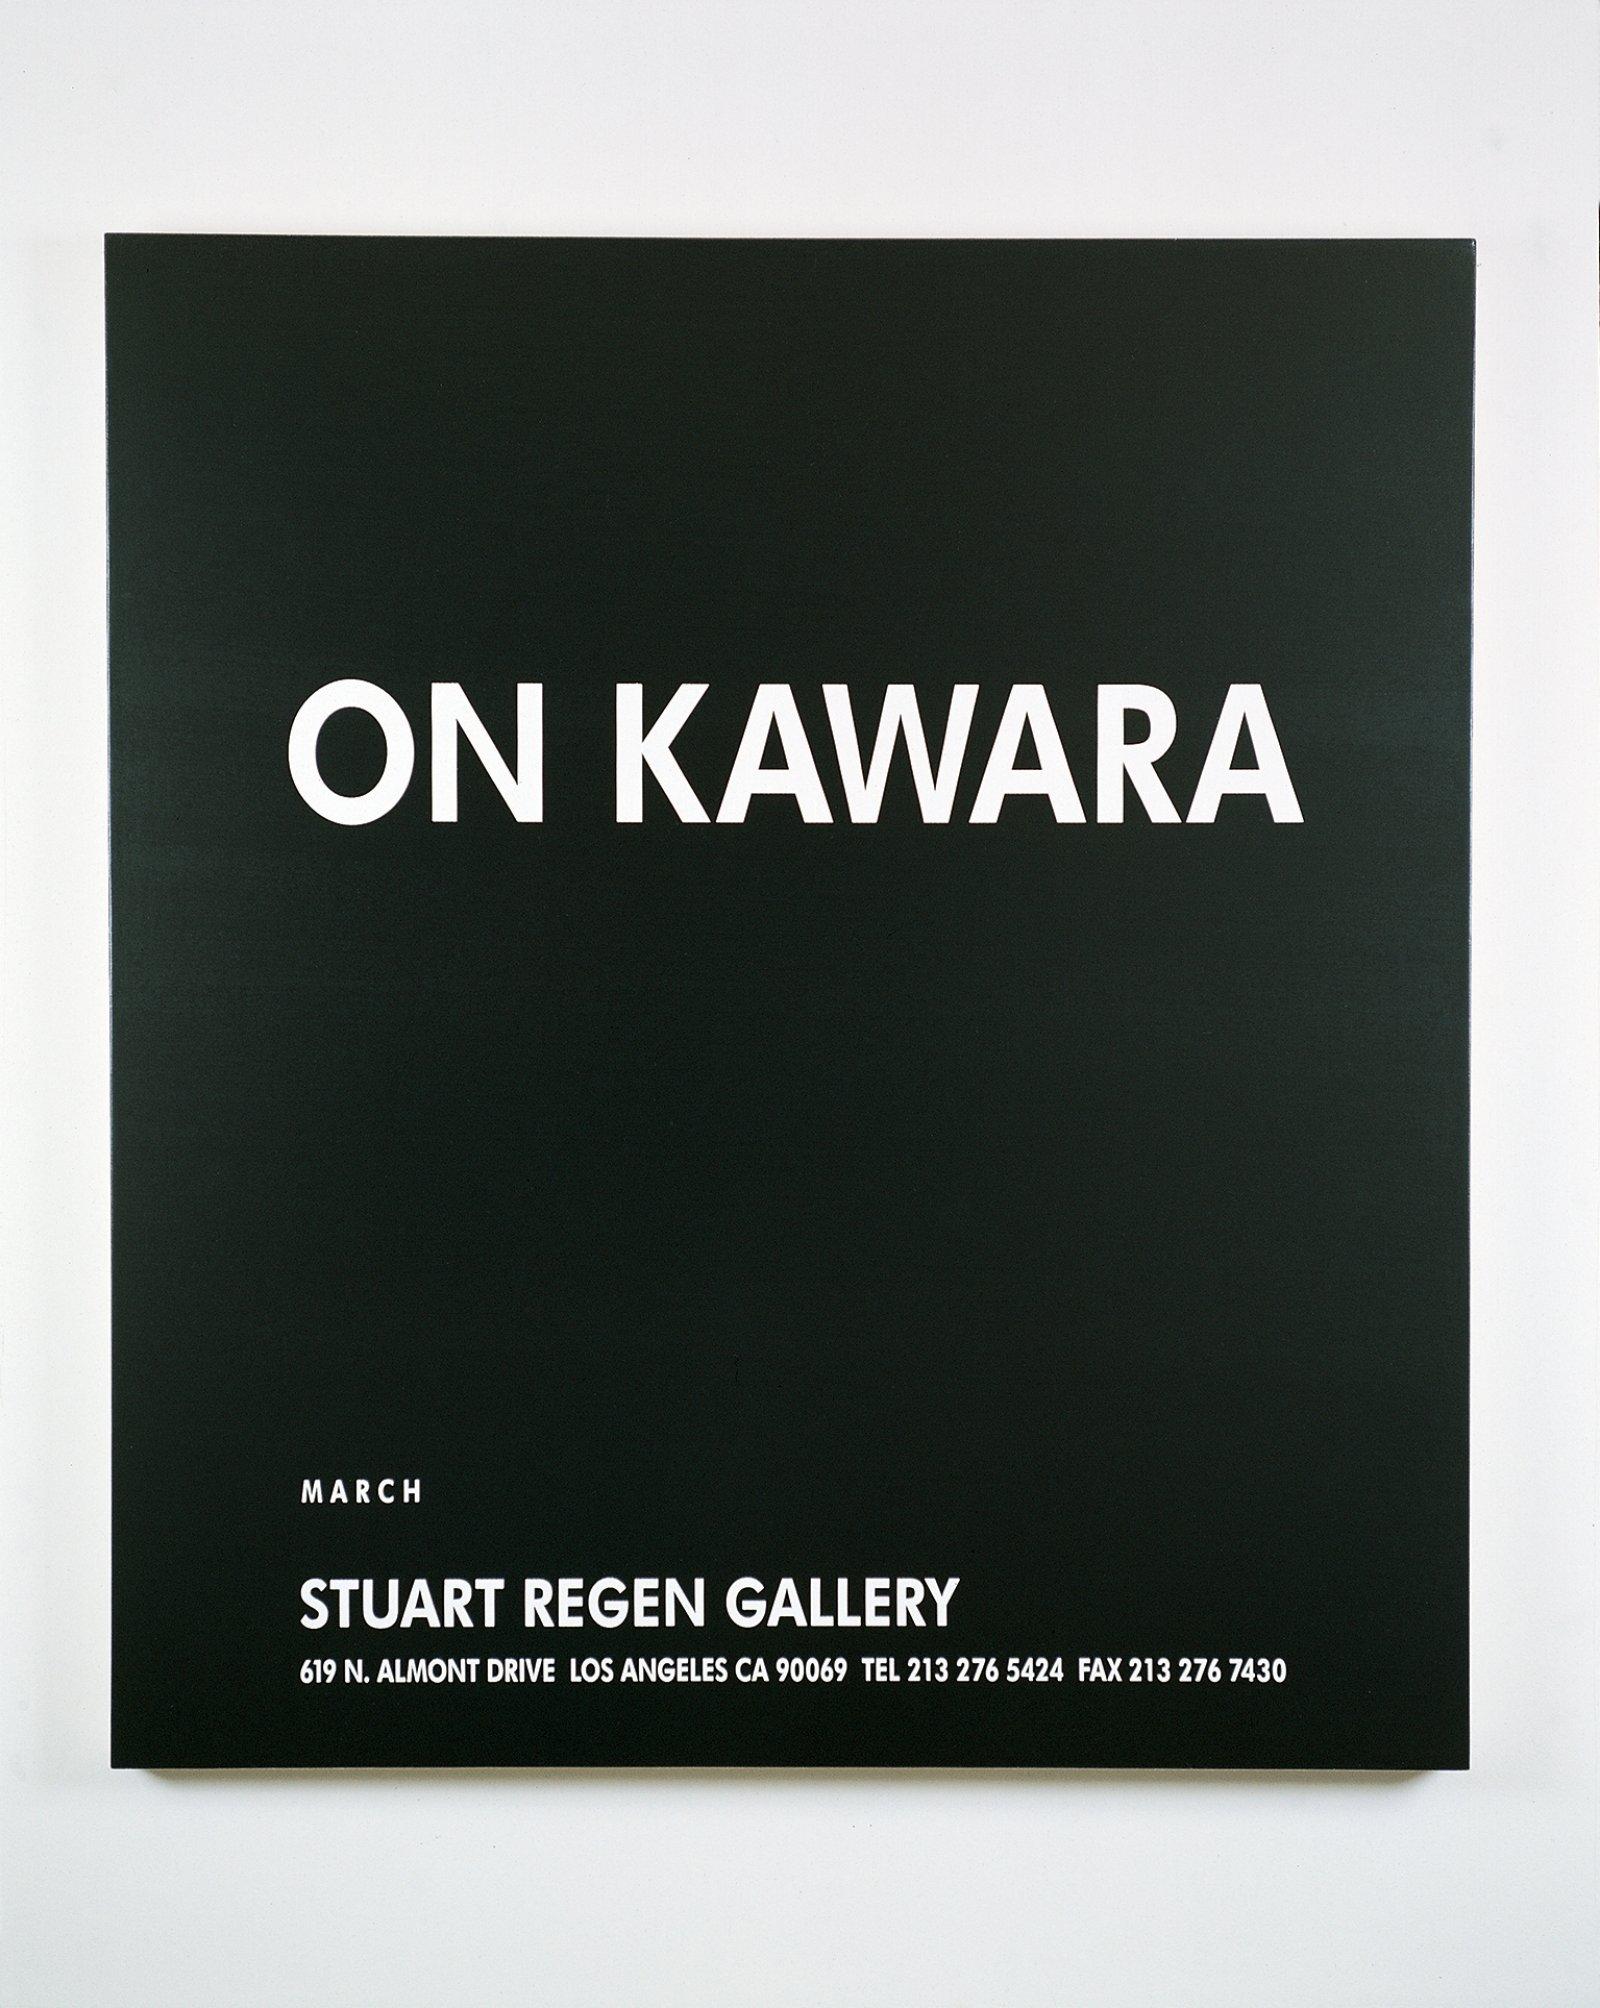 Ron Terada,Untitled (Ad Painting: On Kawara), 1996, acrylic on canvas, 40 x 37 in. (102 x 94 cm)